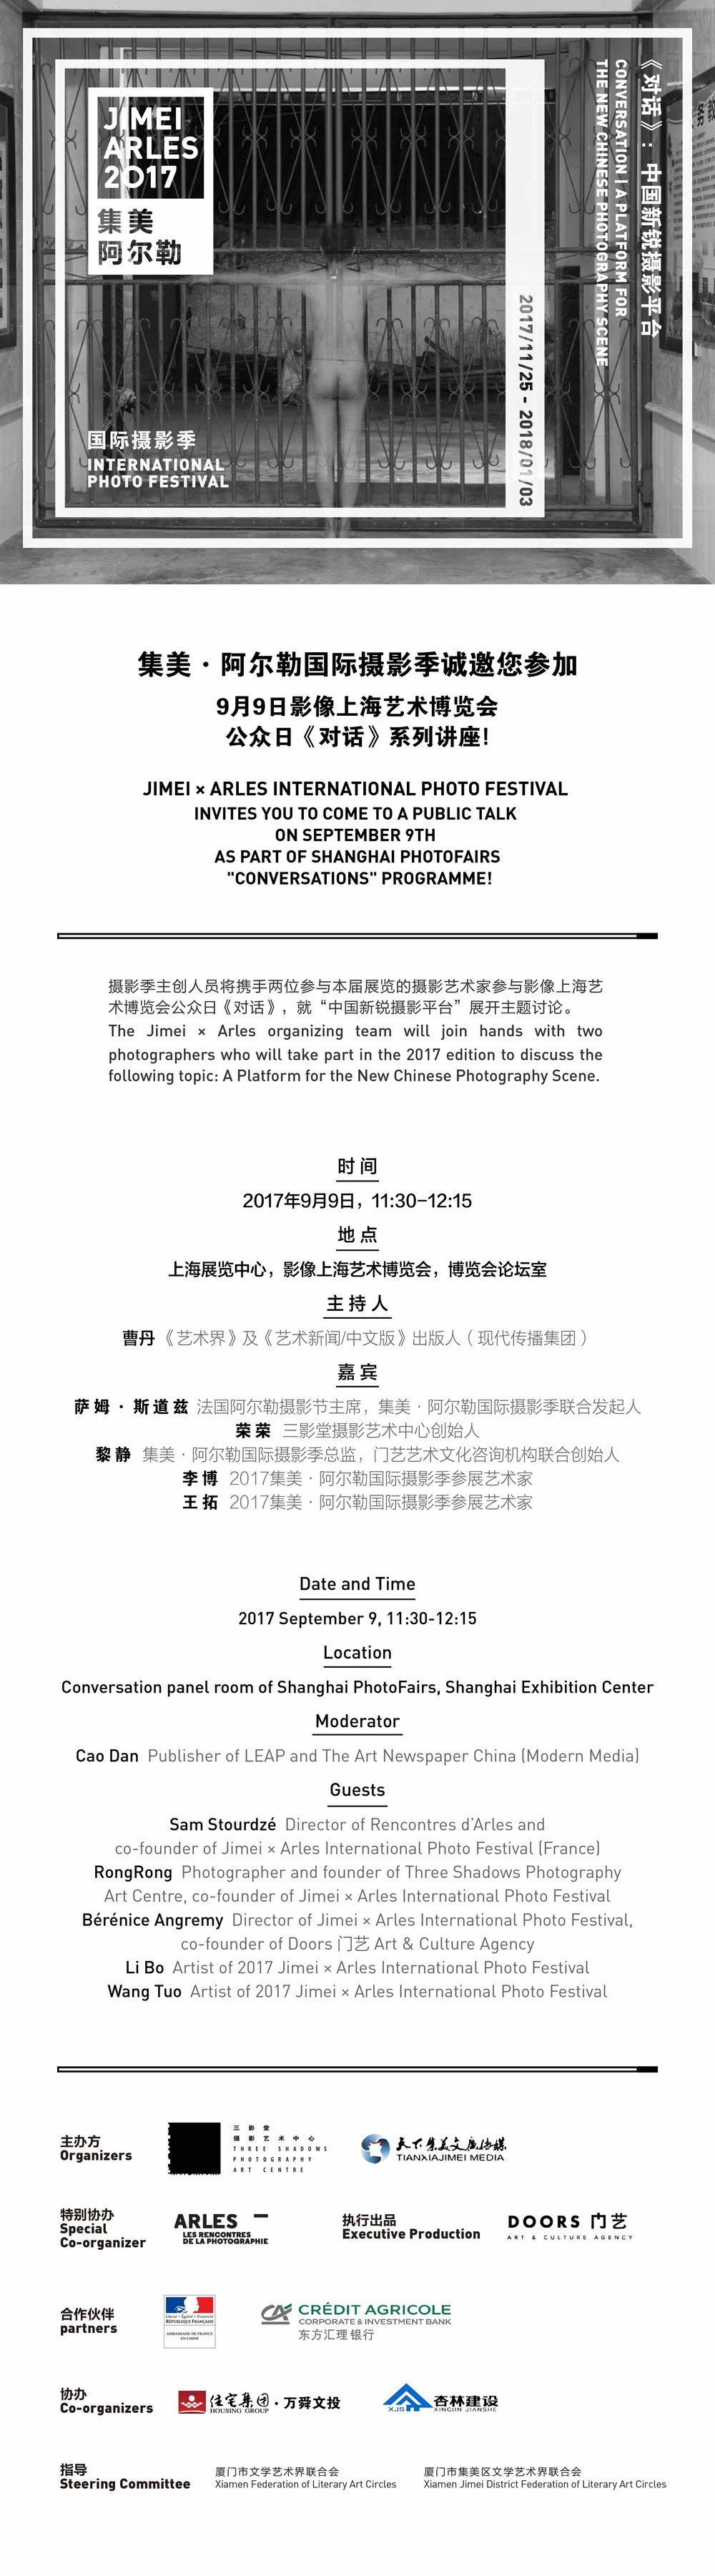 flyer2bd.jpg